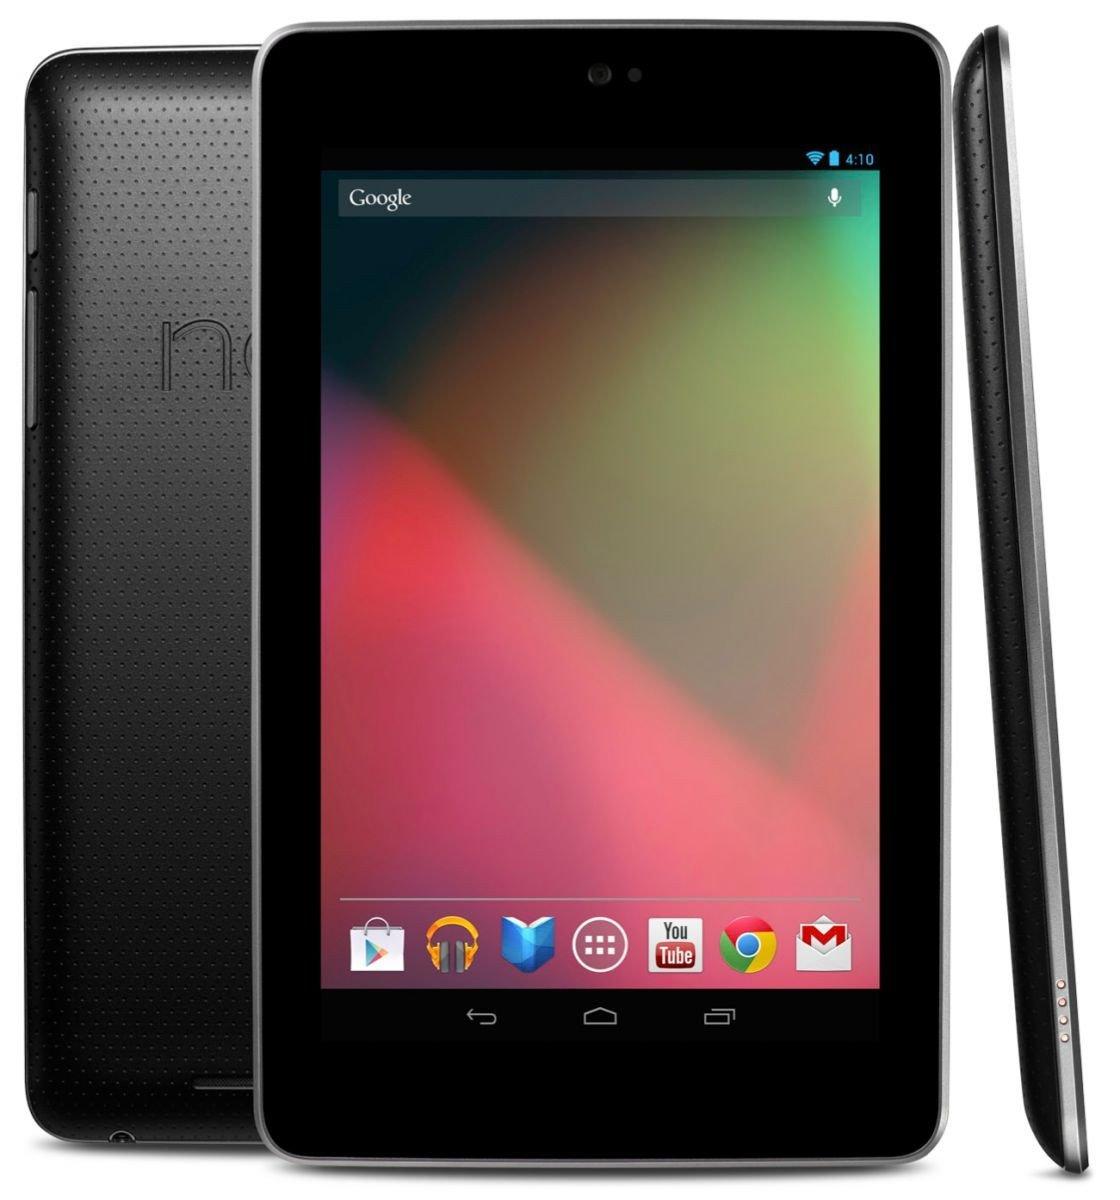 Google Cardboard for Nexus 7 Google Nexus 7 アクセサリー